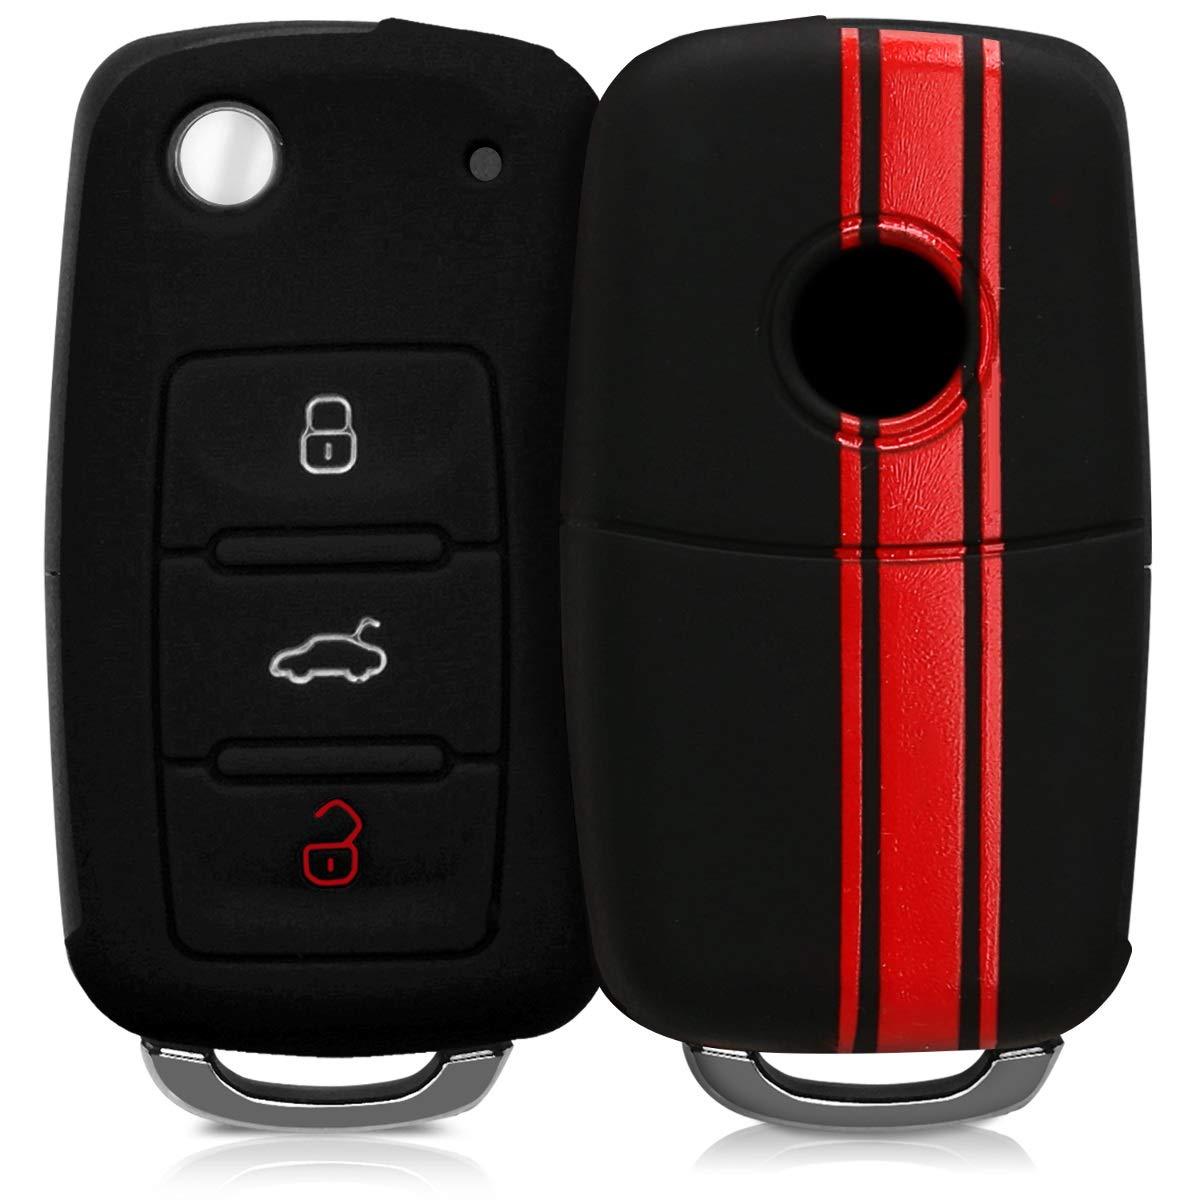 kwmobile Funda para Llave de 3 Botones para Coche VW Skoda Seat - Carcasa Protectora Suave de Silicona - Case de Mando de Auto con diseño de Rally